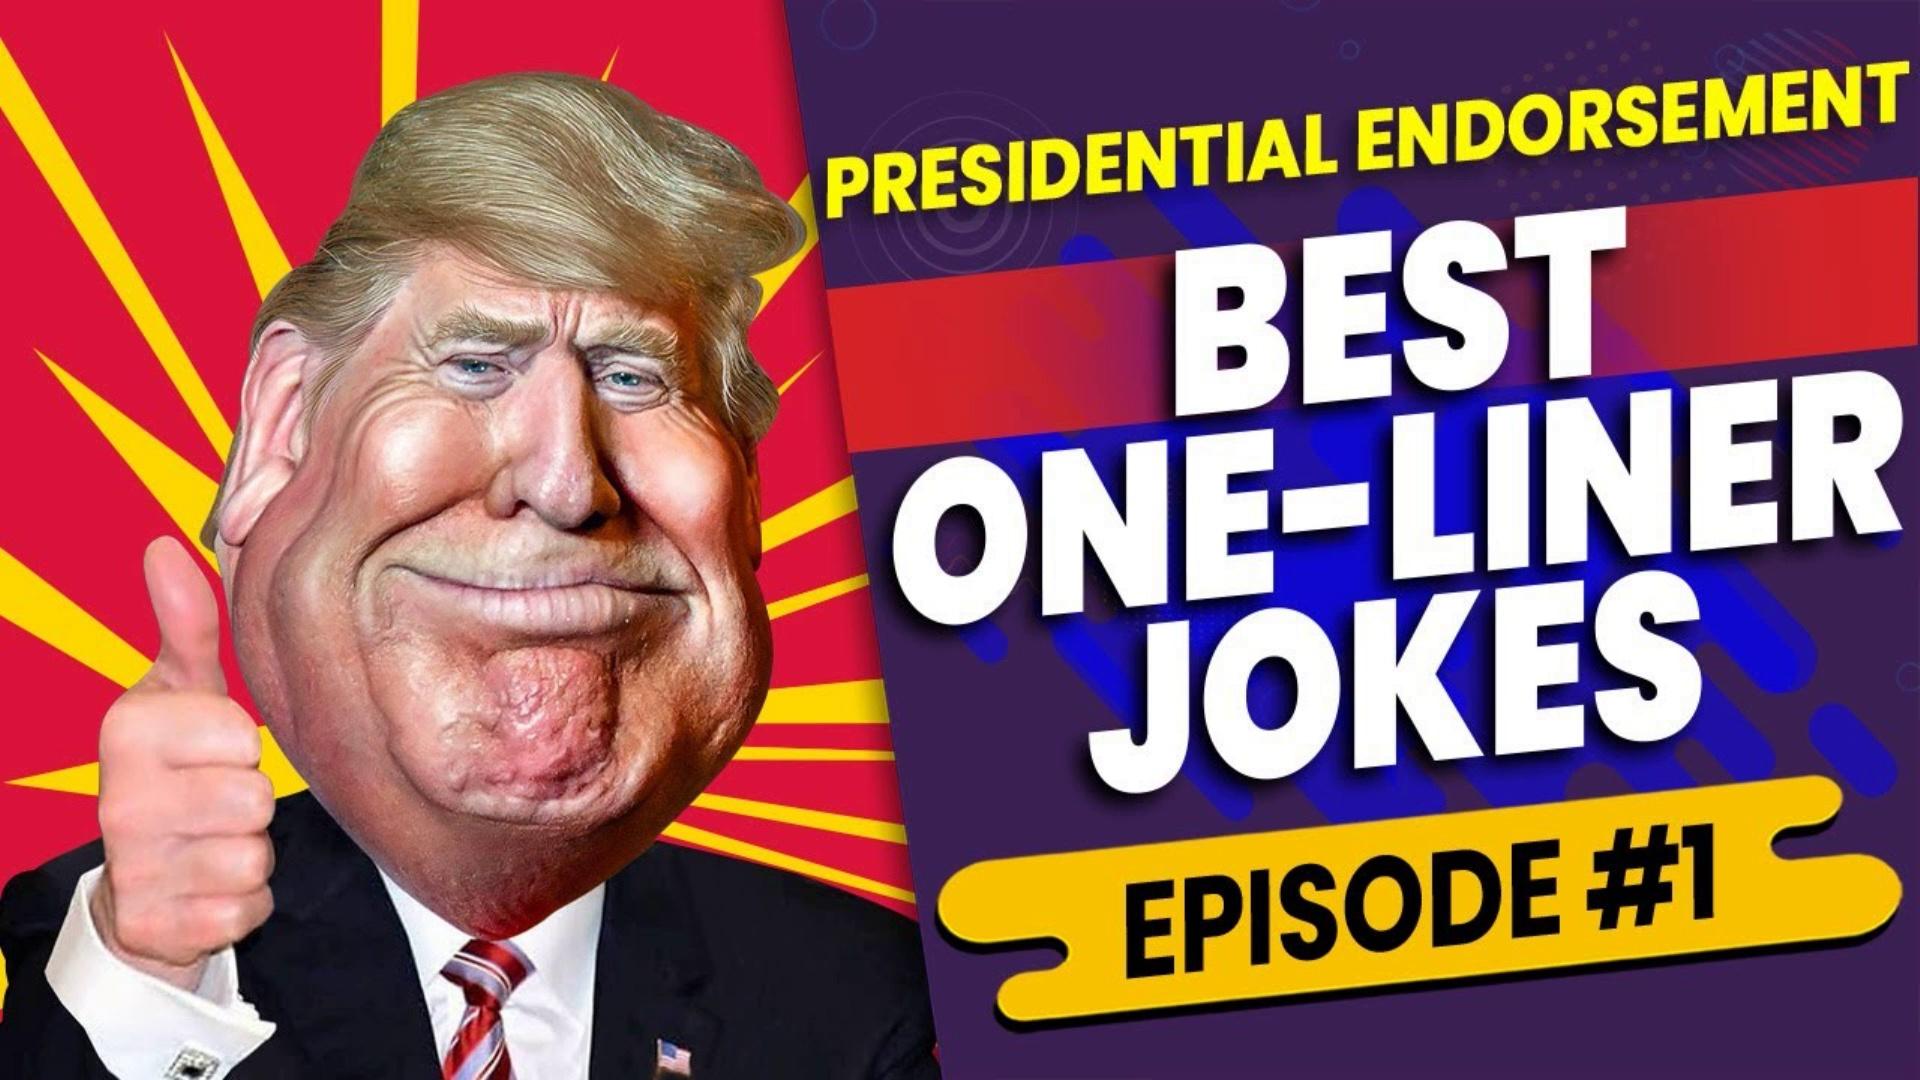 Donald Trump Jokes | Donald Trump Comedy | Donald Trump Humor | Donald Trump Funniest Jokes